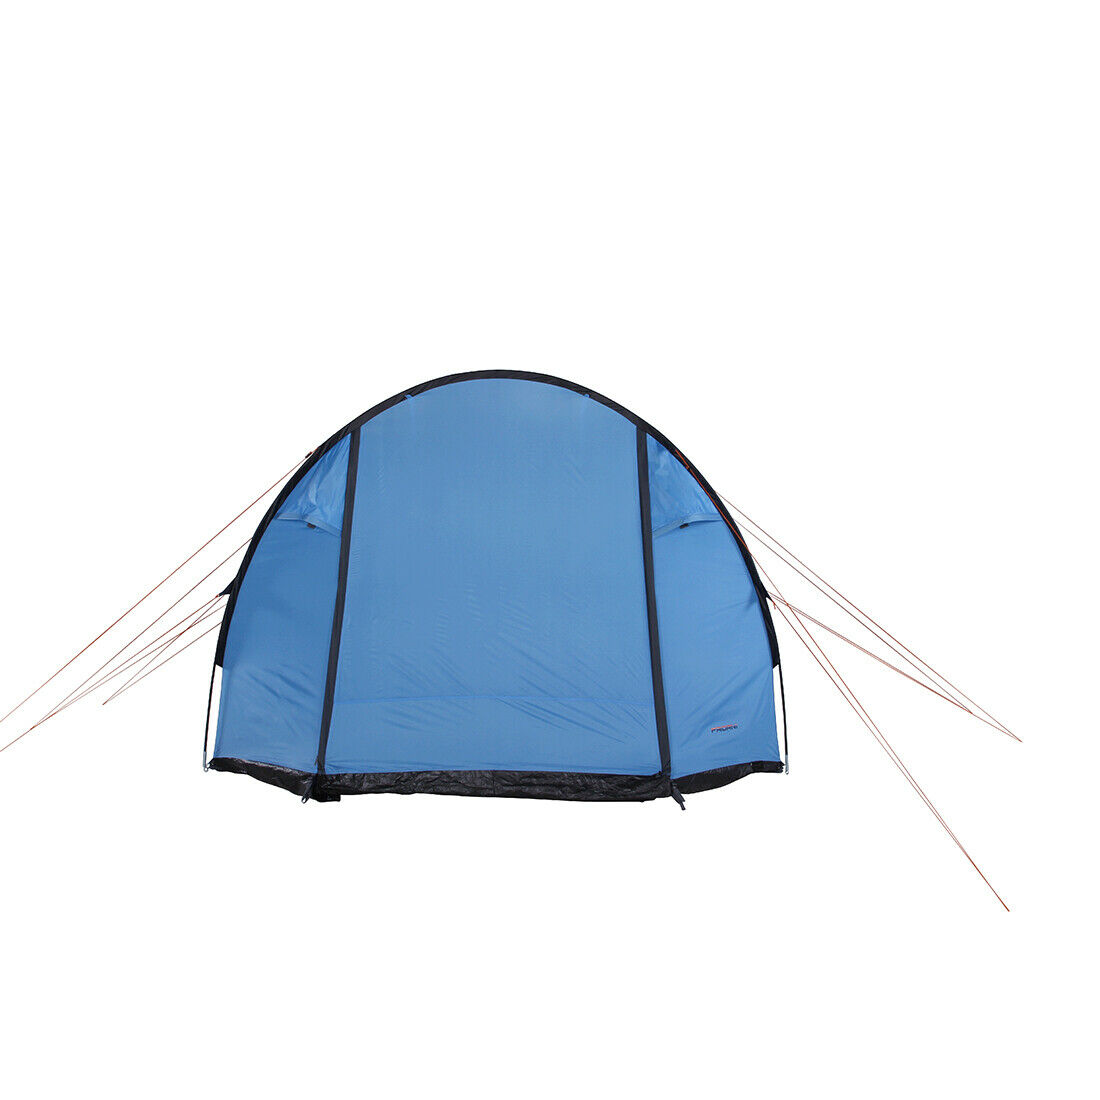 TXB 4 Mann Zelt Campingzelt Tunnelzelt 3000mm Stehhöhe